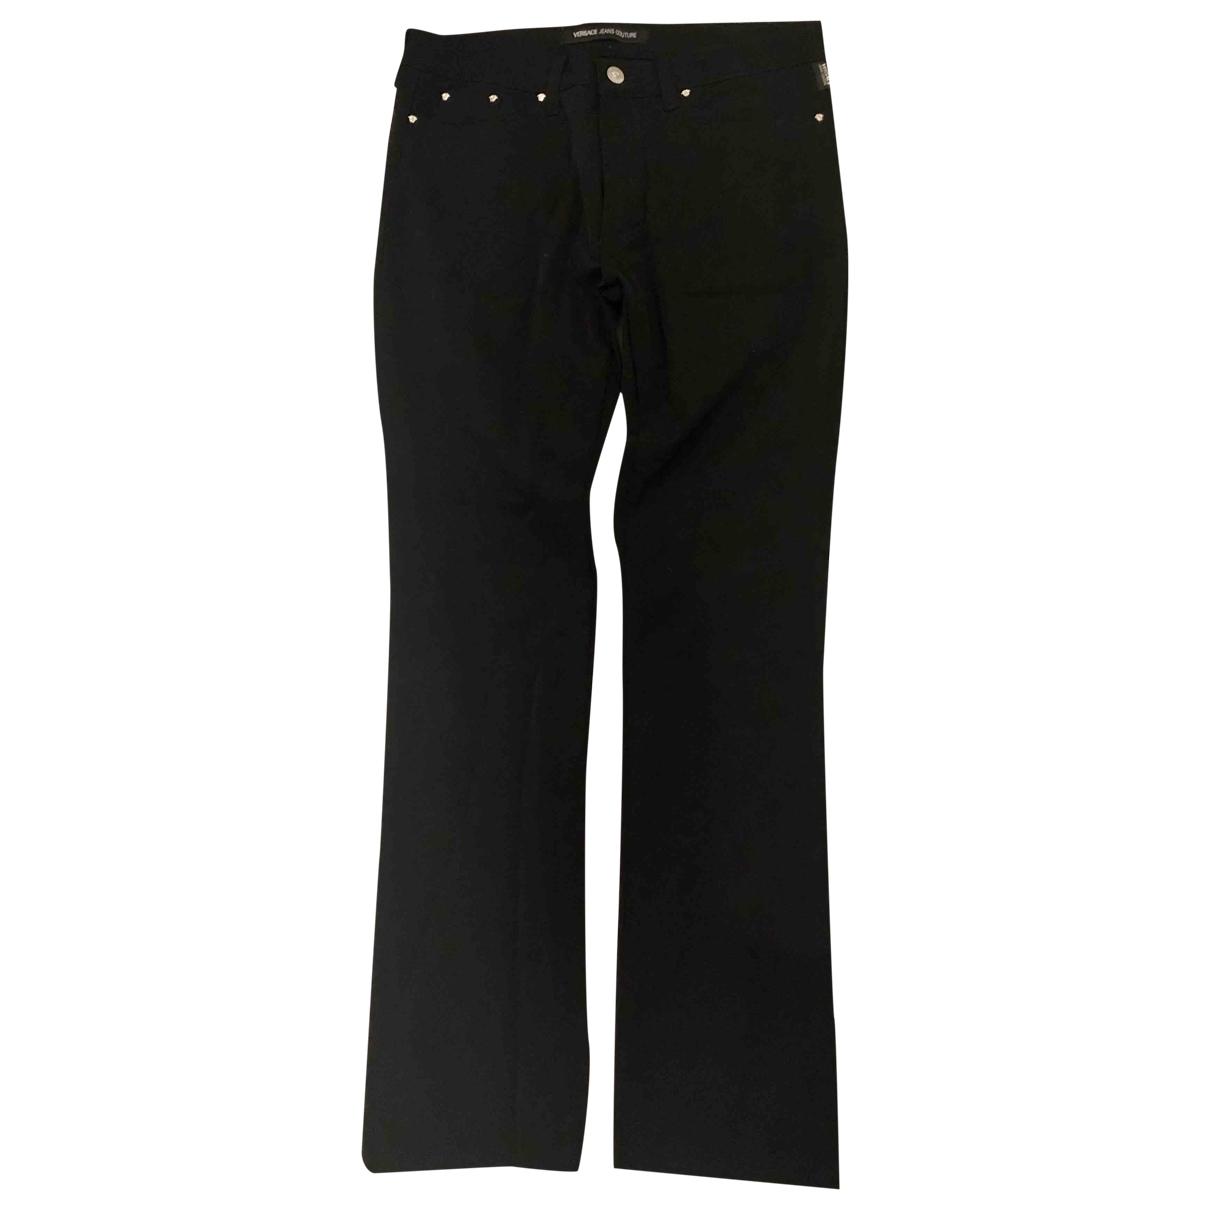 Versace Jeans \N Black Cotton - elasthane Jeans for Women 32 FR